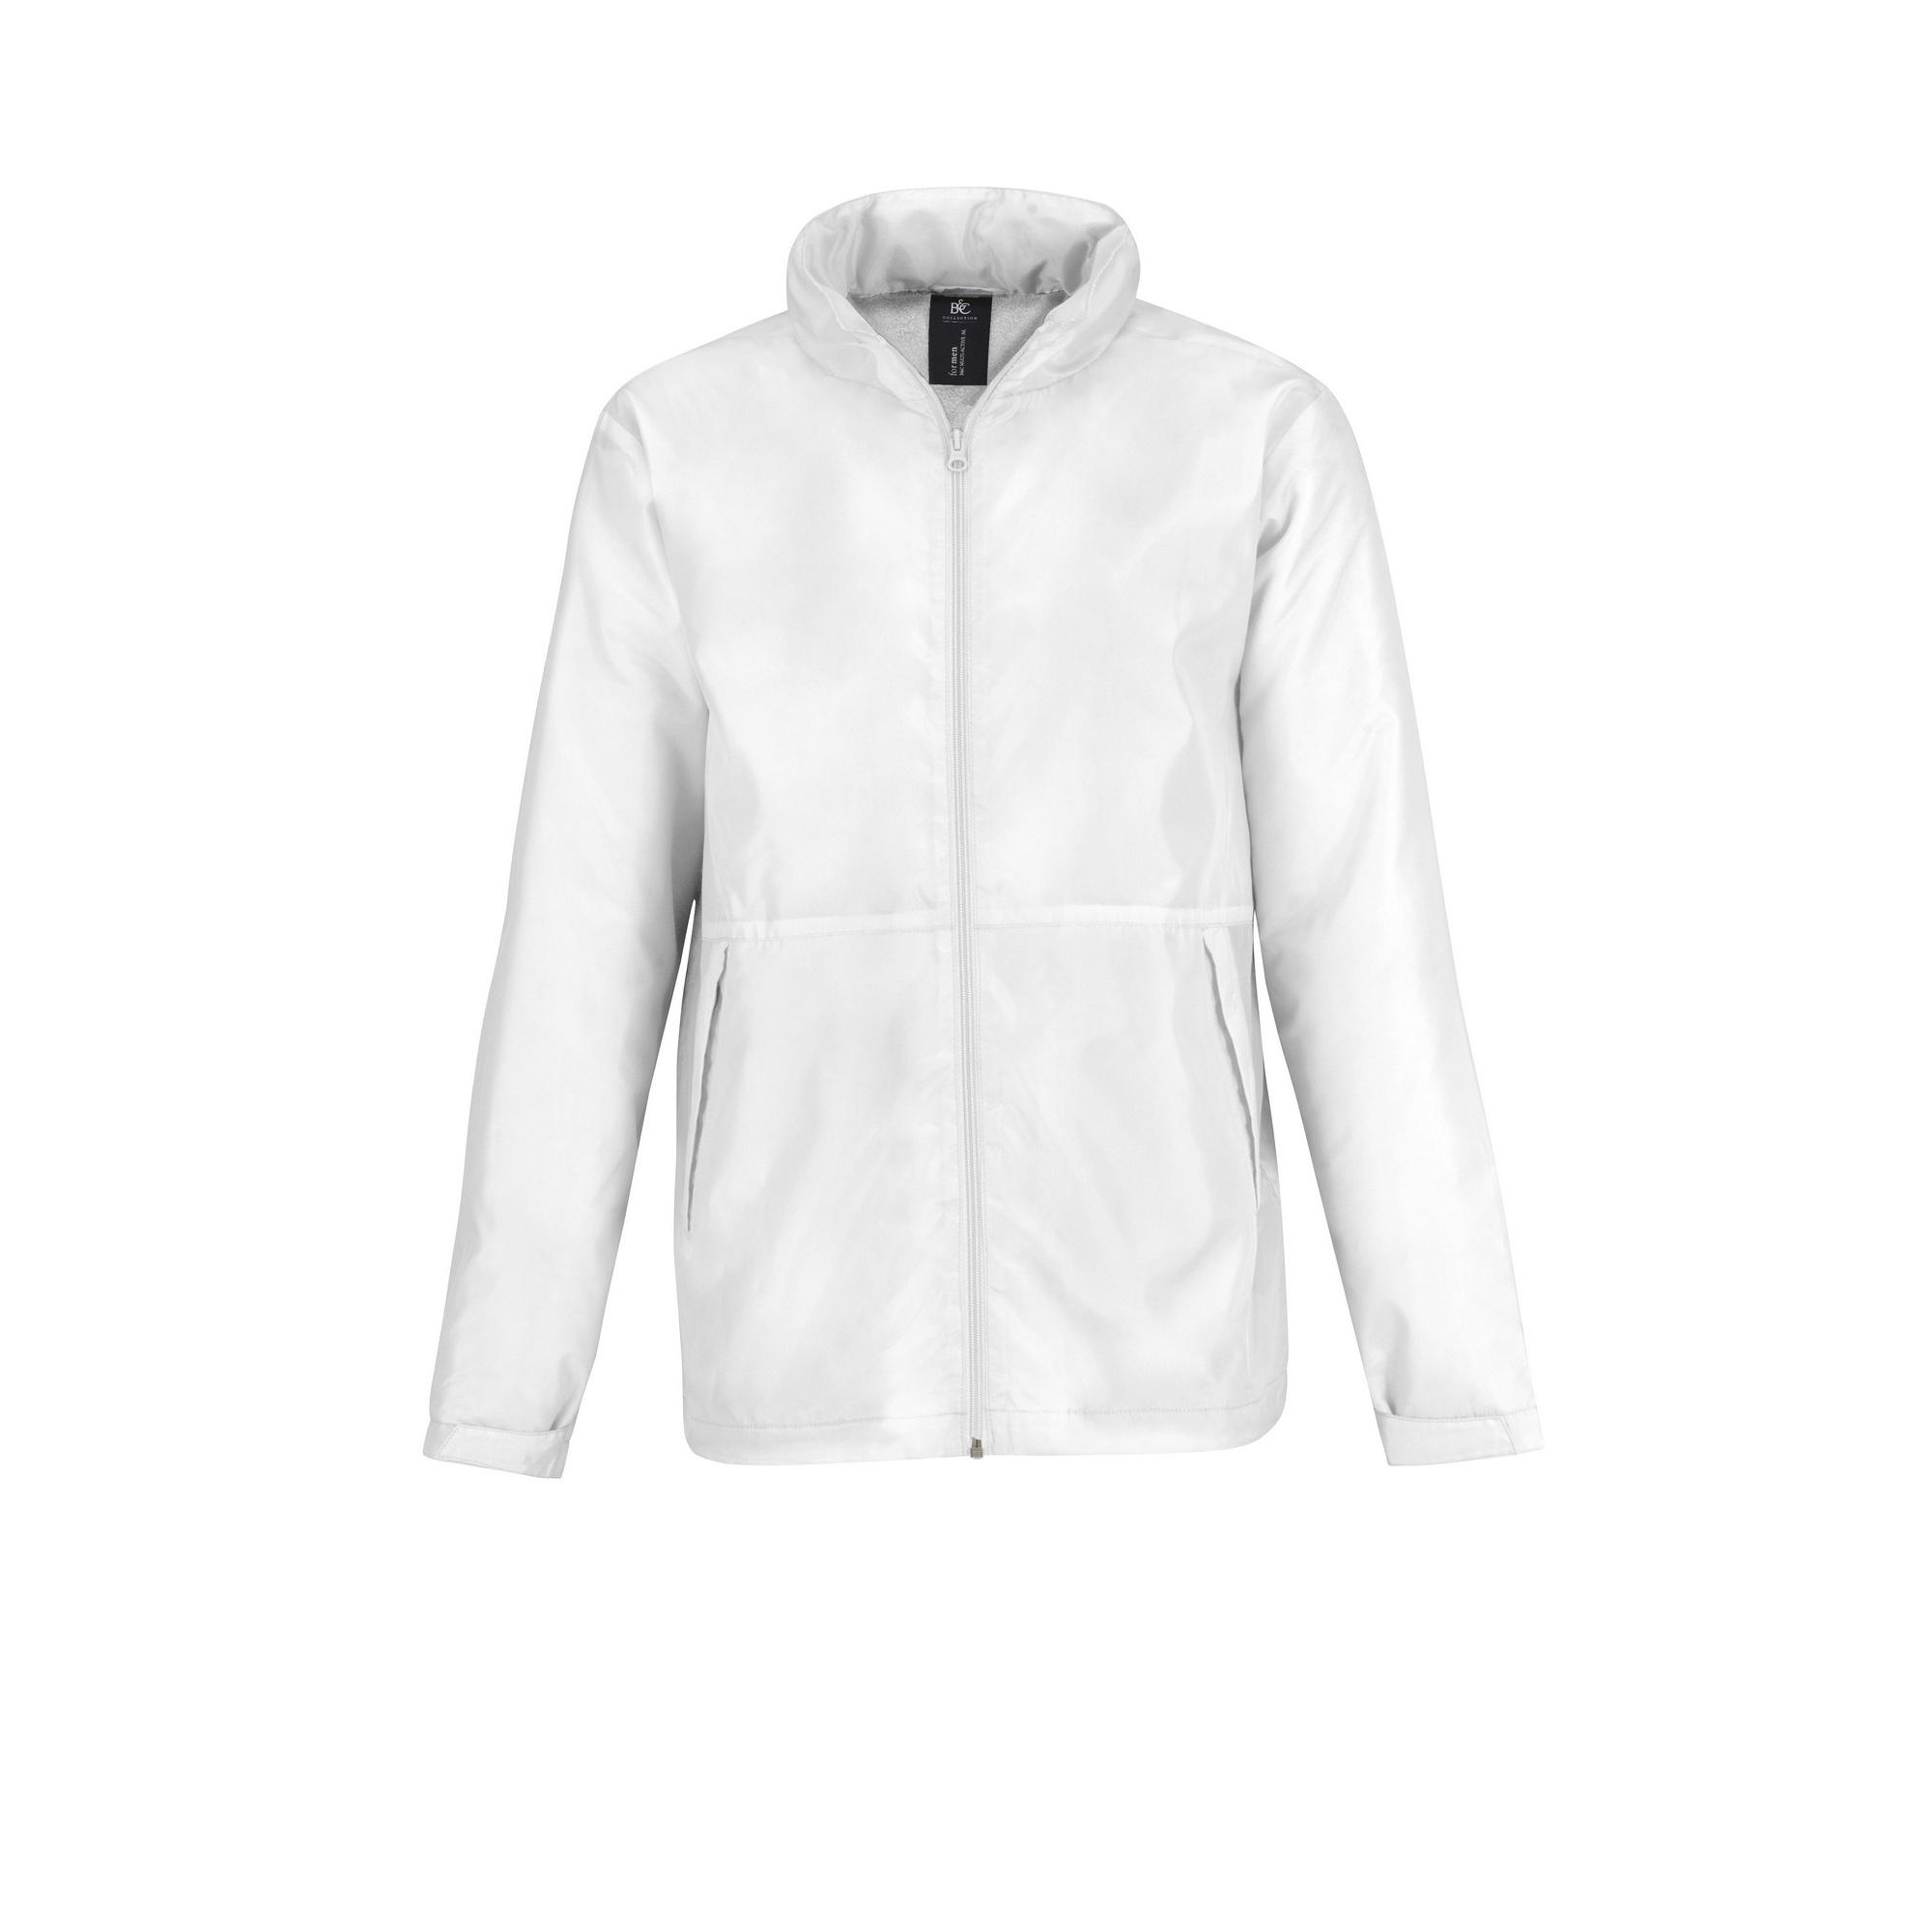 B&C Mens Multi Active Hooded Fleece Lined Jacket (2XL) (White/ White)